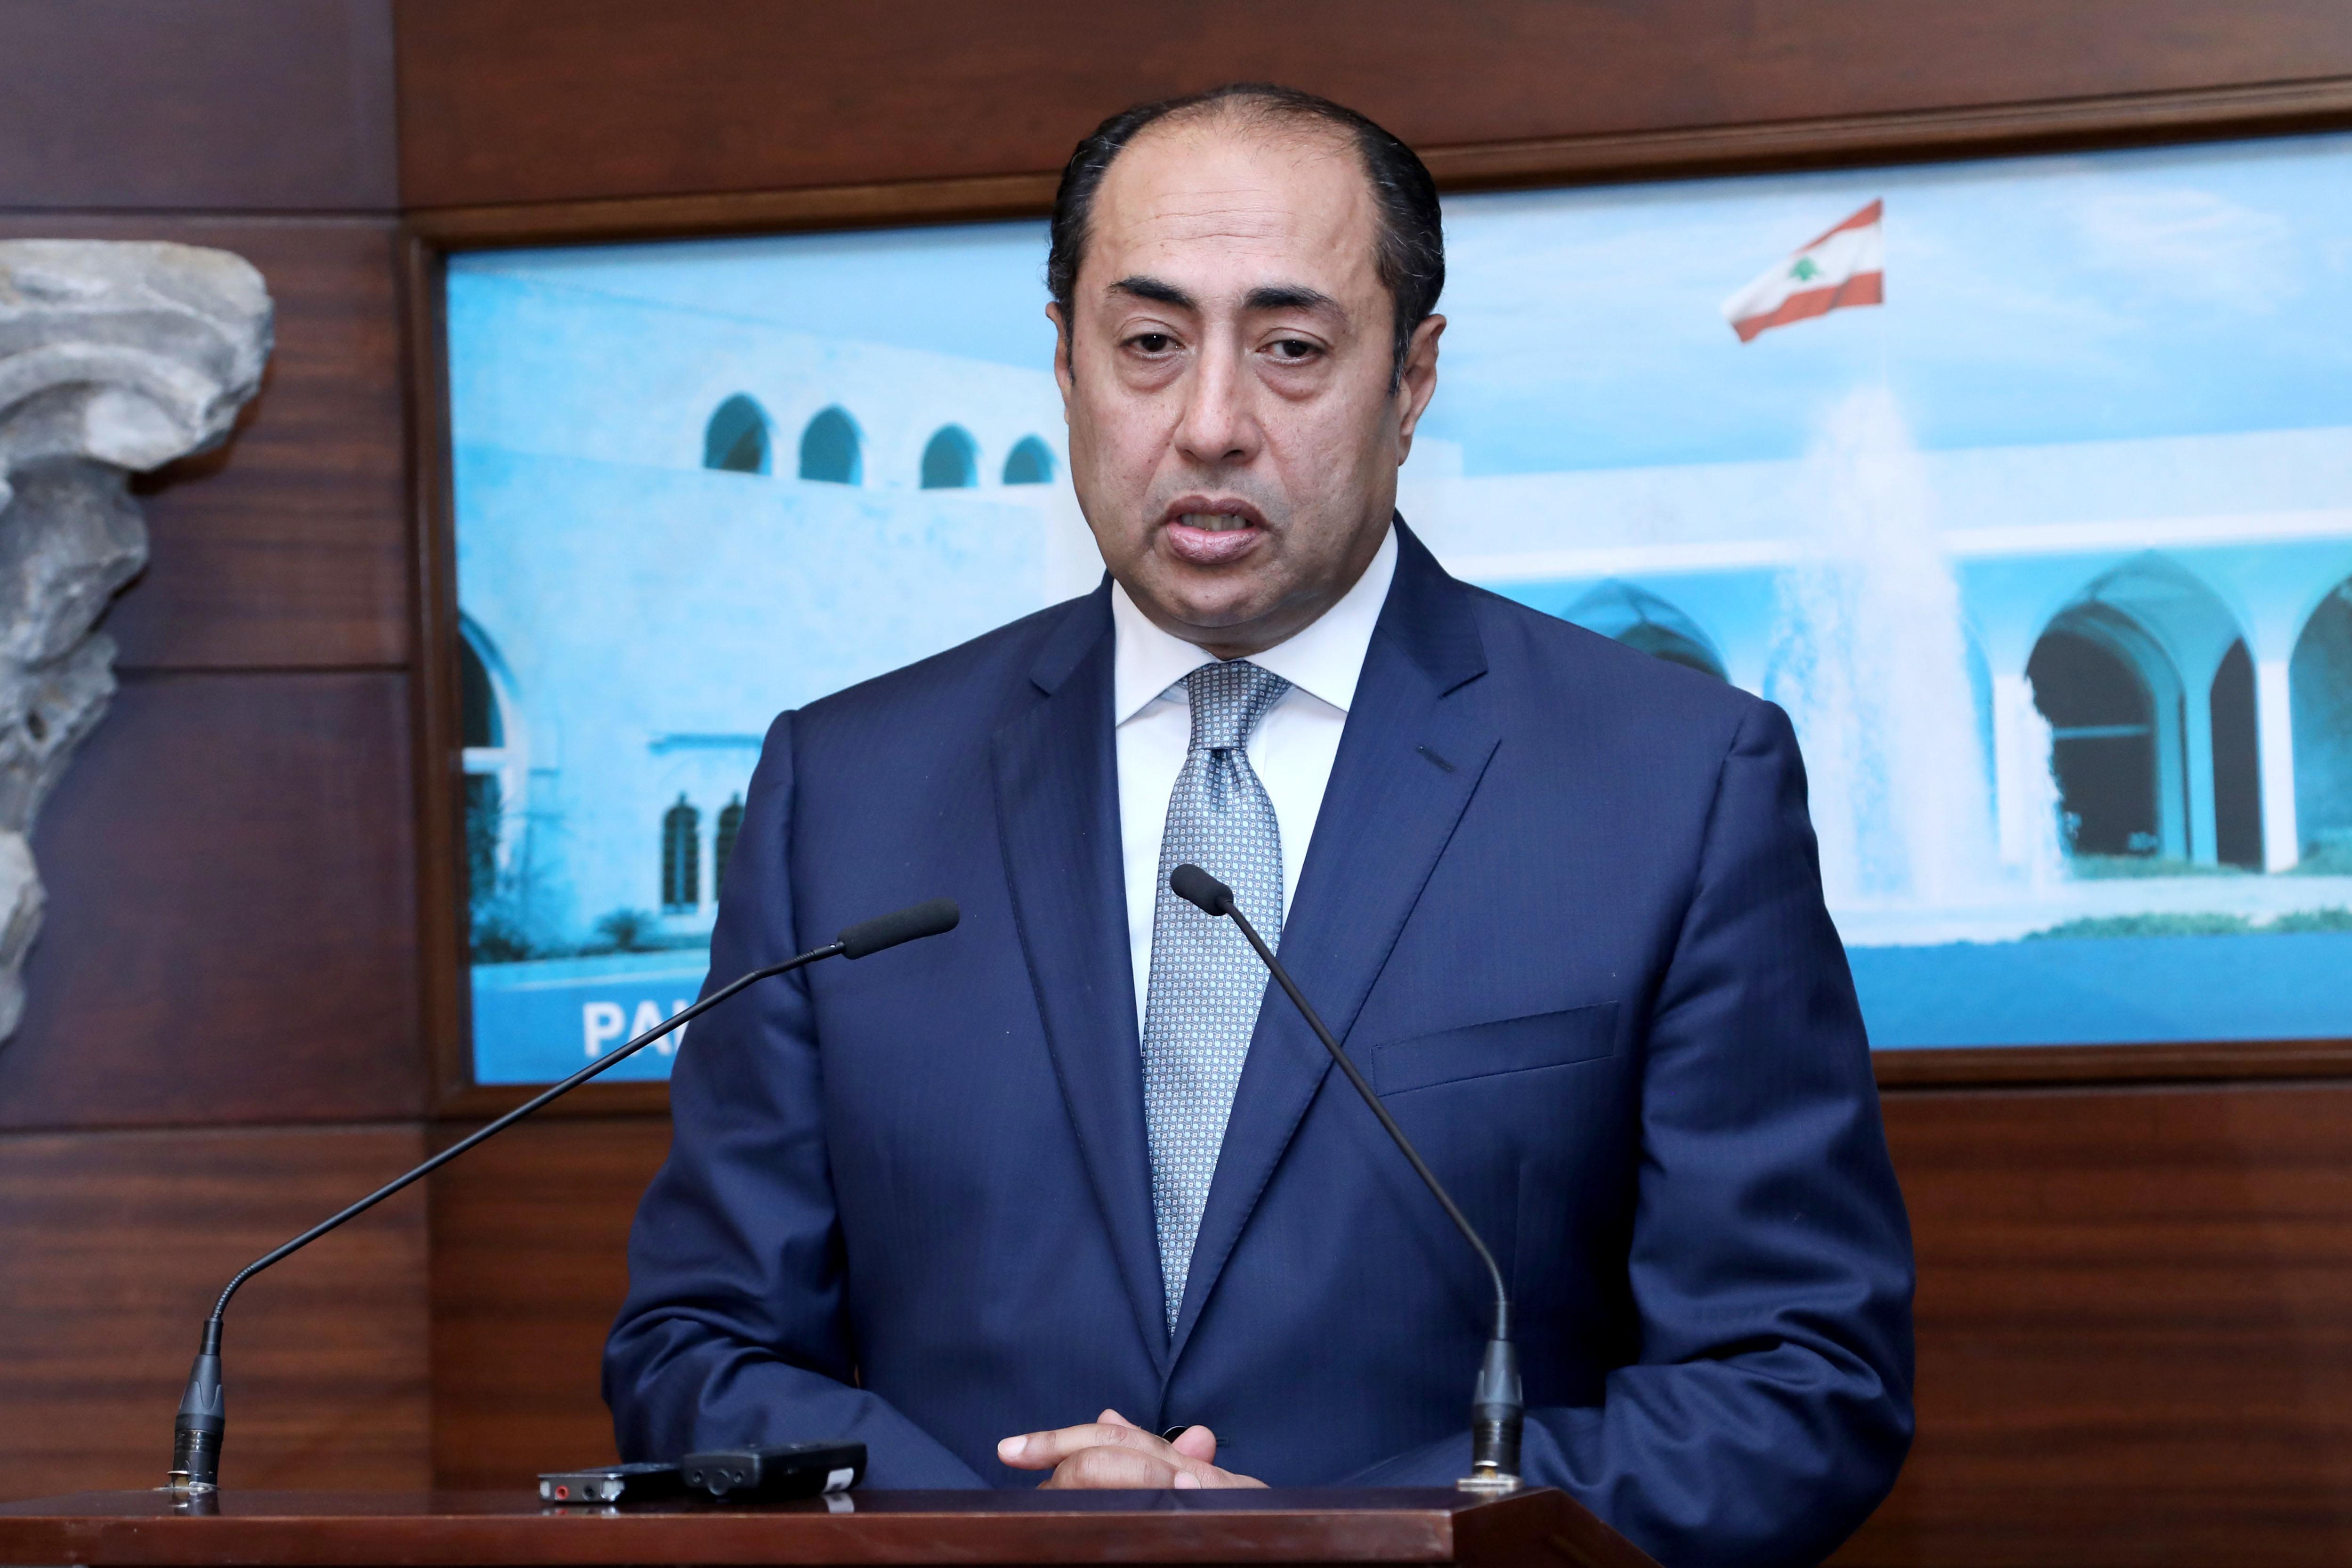 1 - Ambassador Hossam Zaki 1